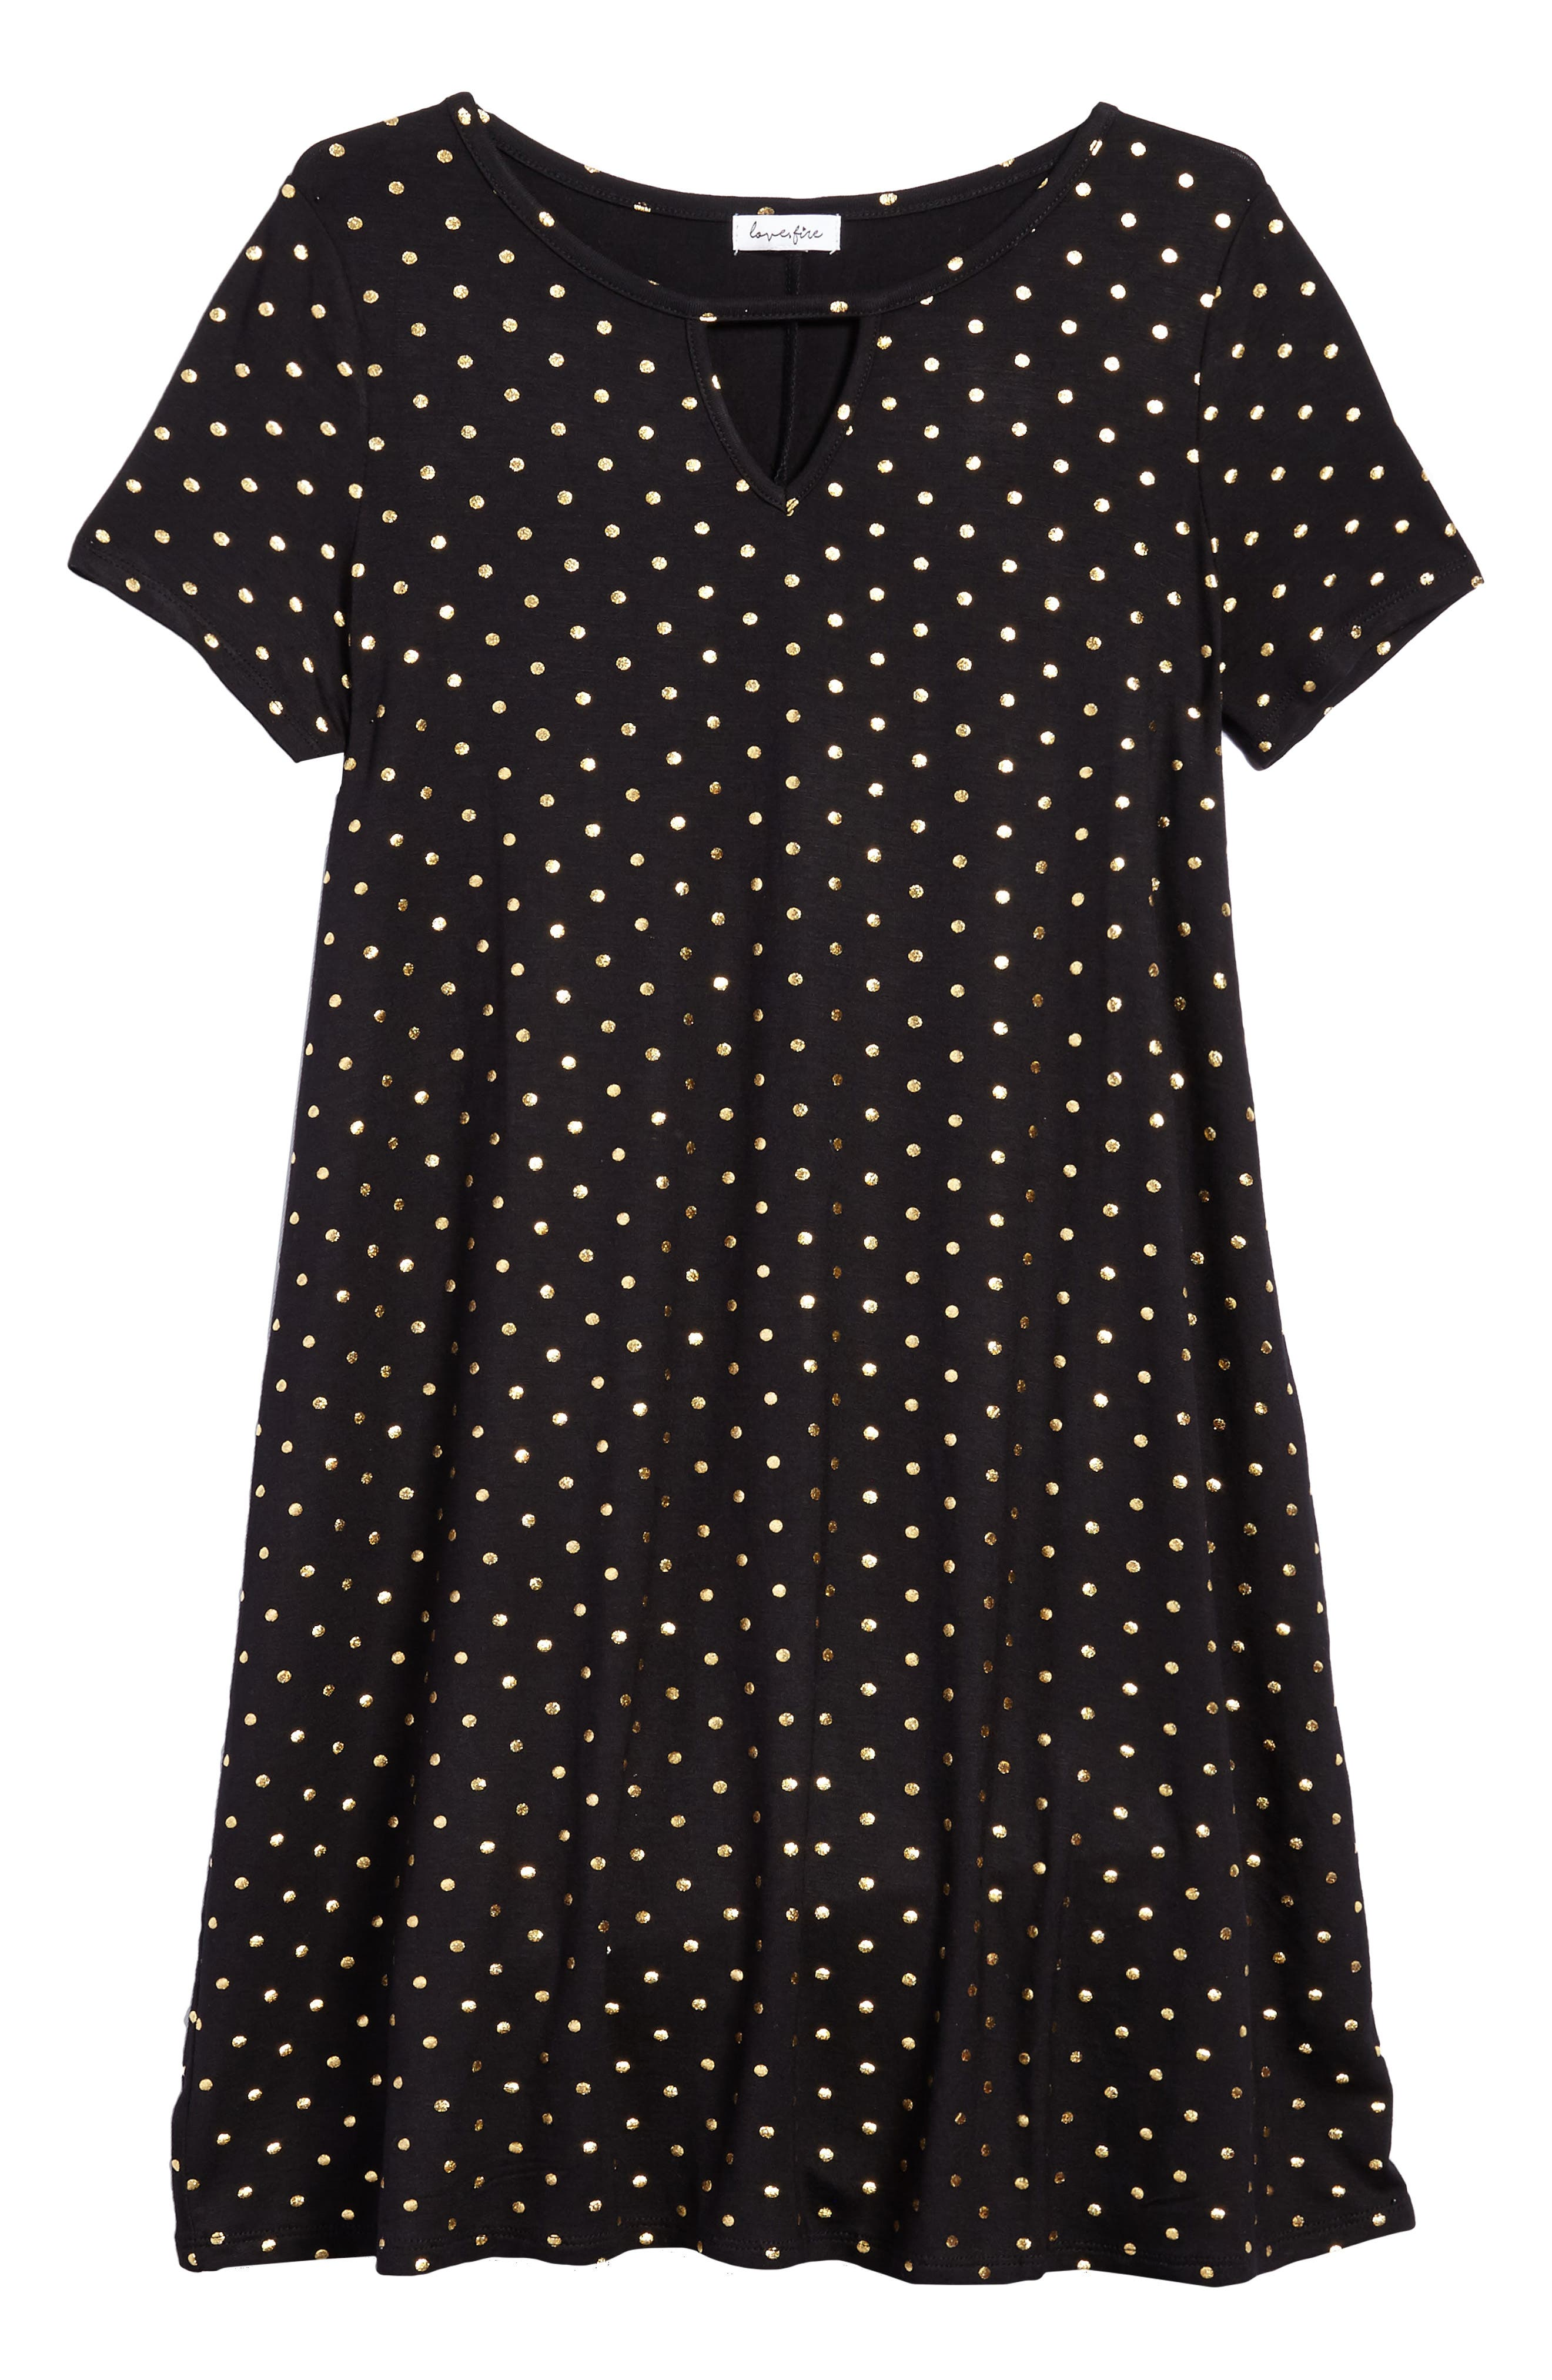 Foil Polka Dot Jersey Dress,                             Main thumbnail 1, color,                             Black/ Gold Foil